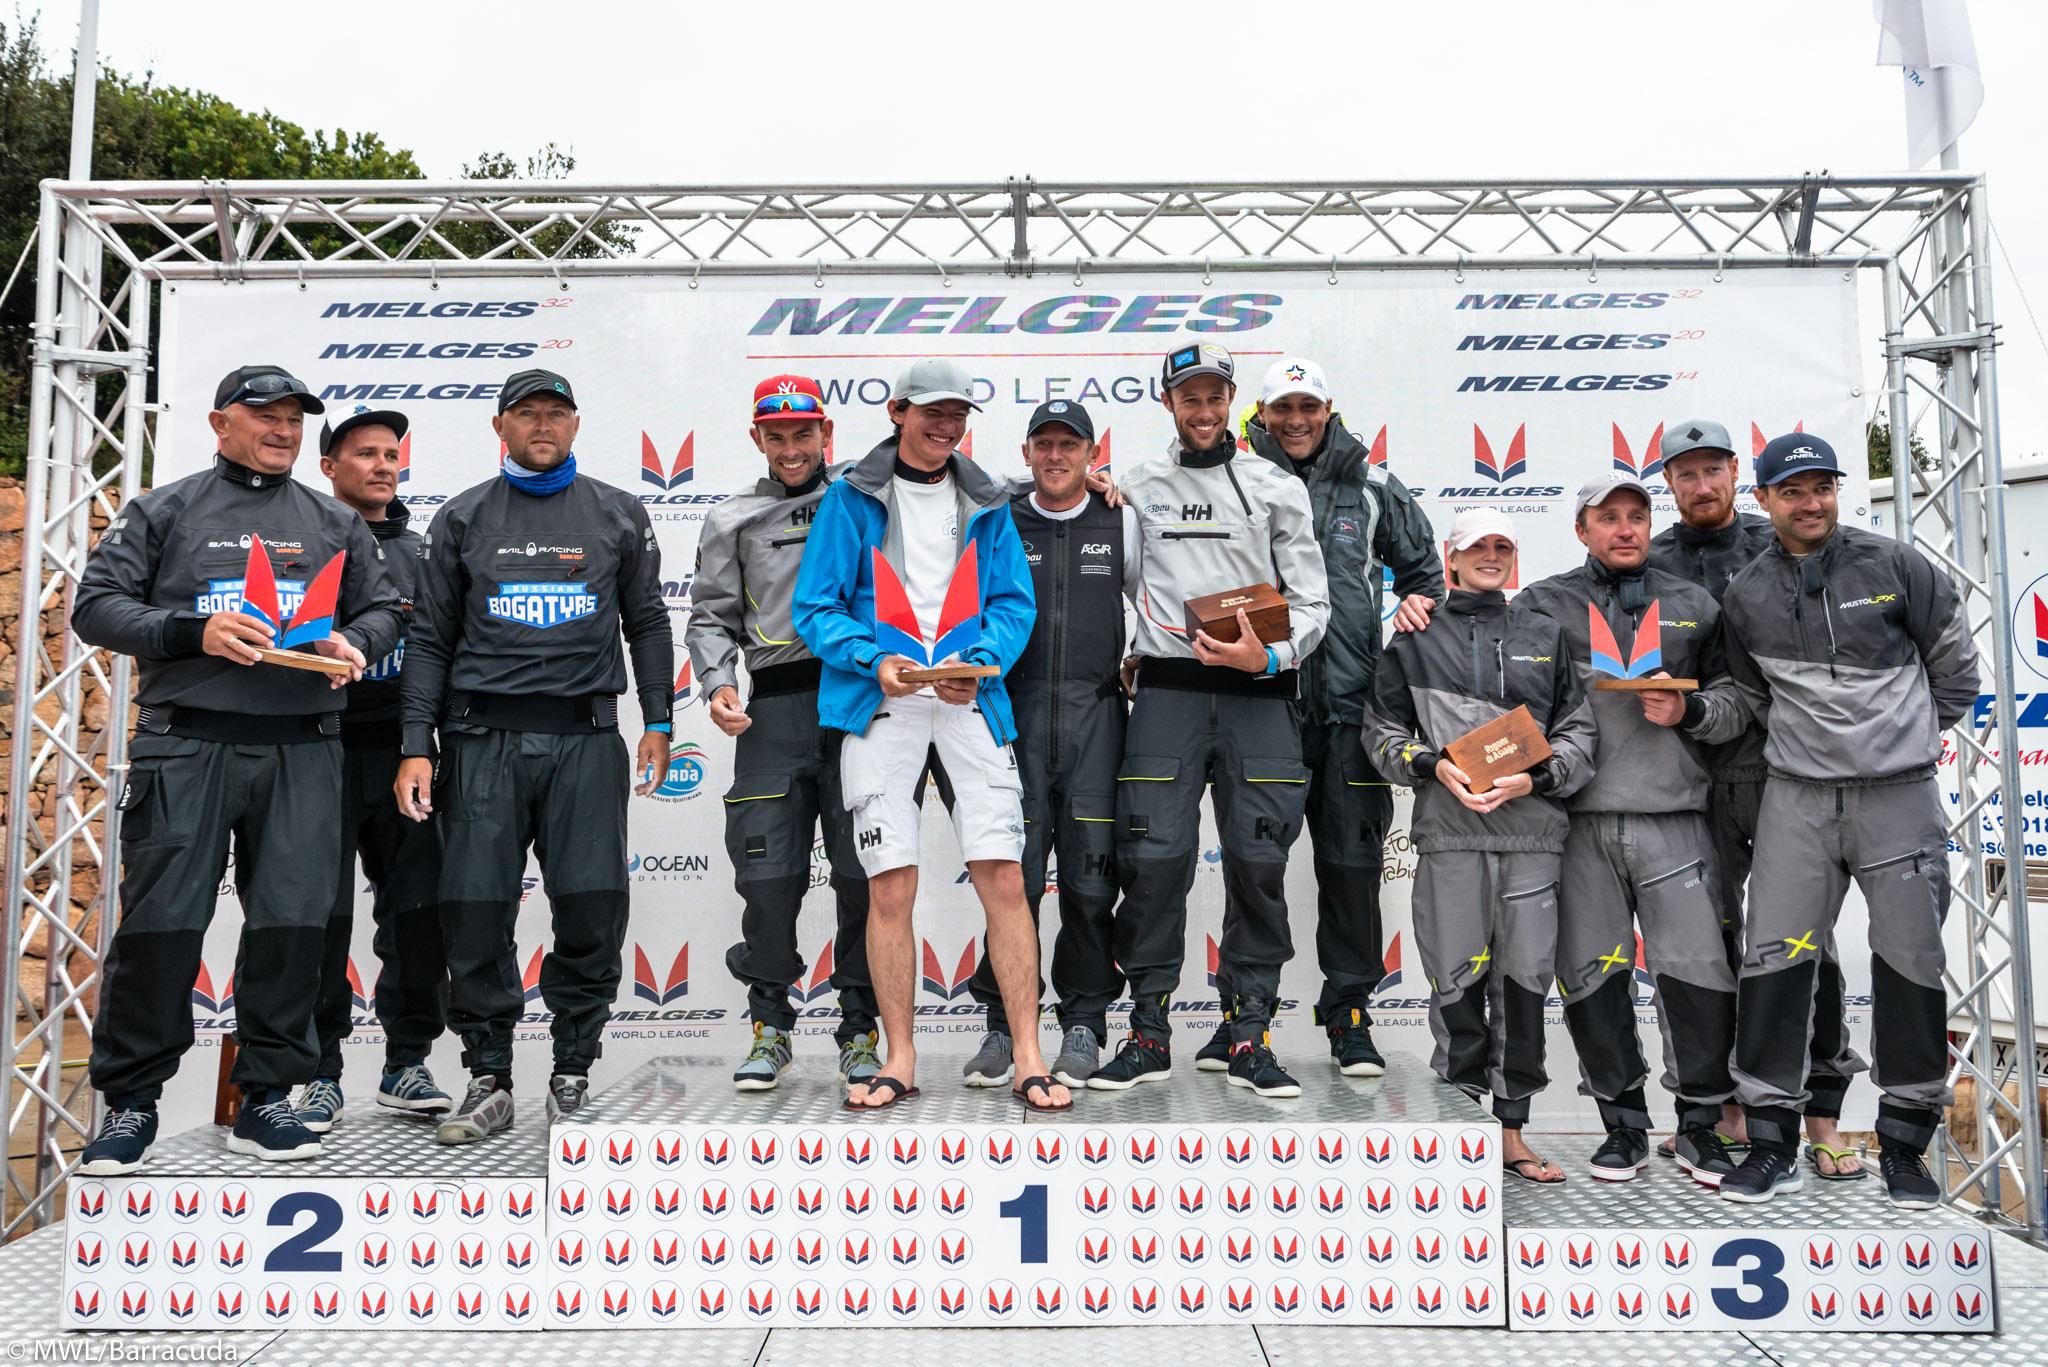 MARINA DI PUNTALDIAMay 24 - 26 - The winner is BOOGIE !!!RESULTSPHOTO GALLERYVIDEO GALLERY